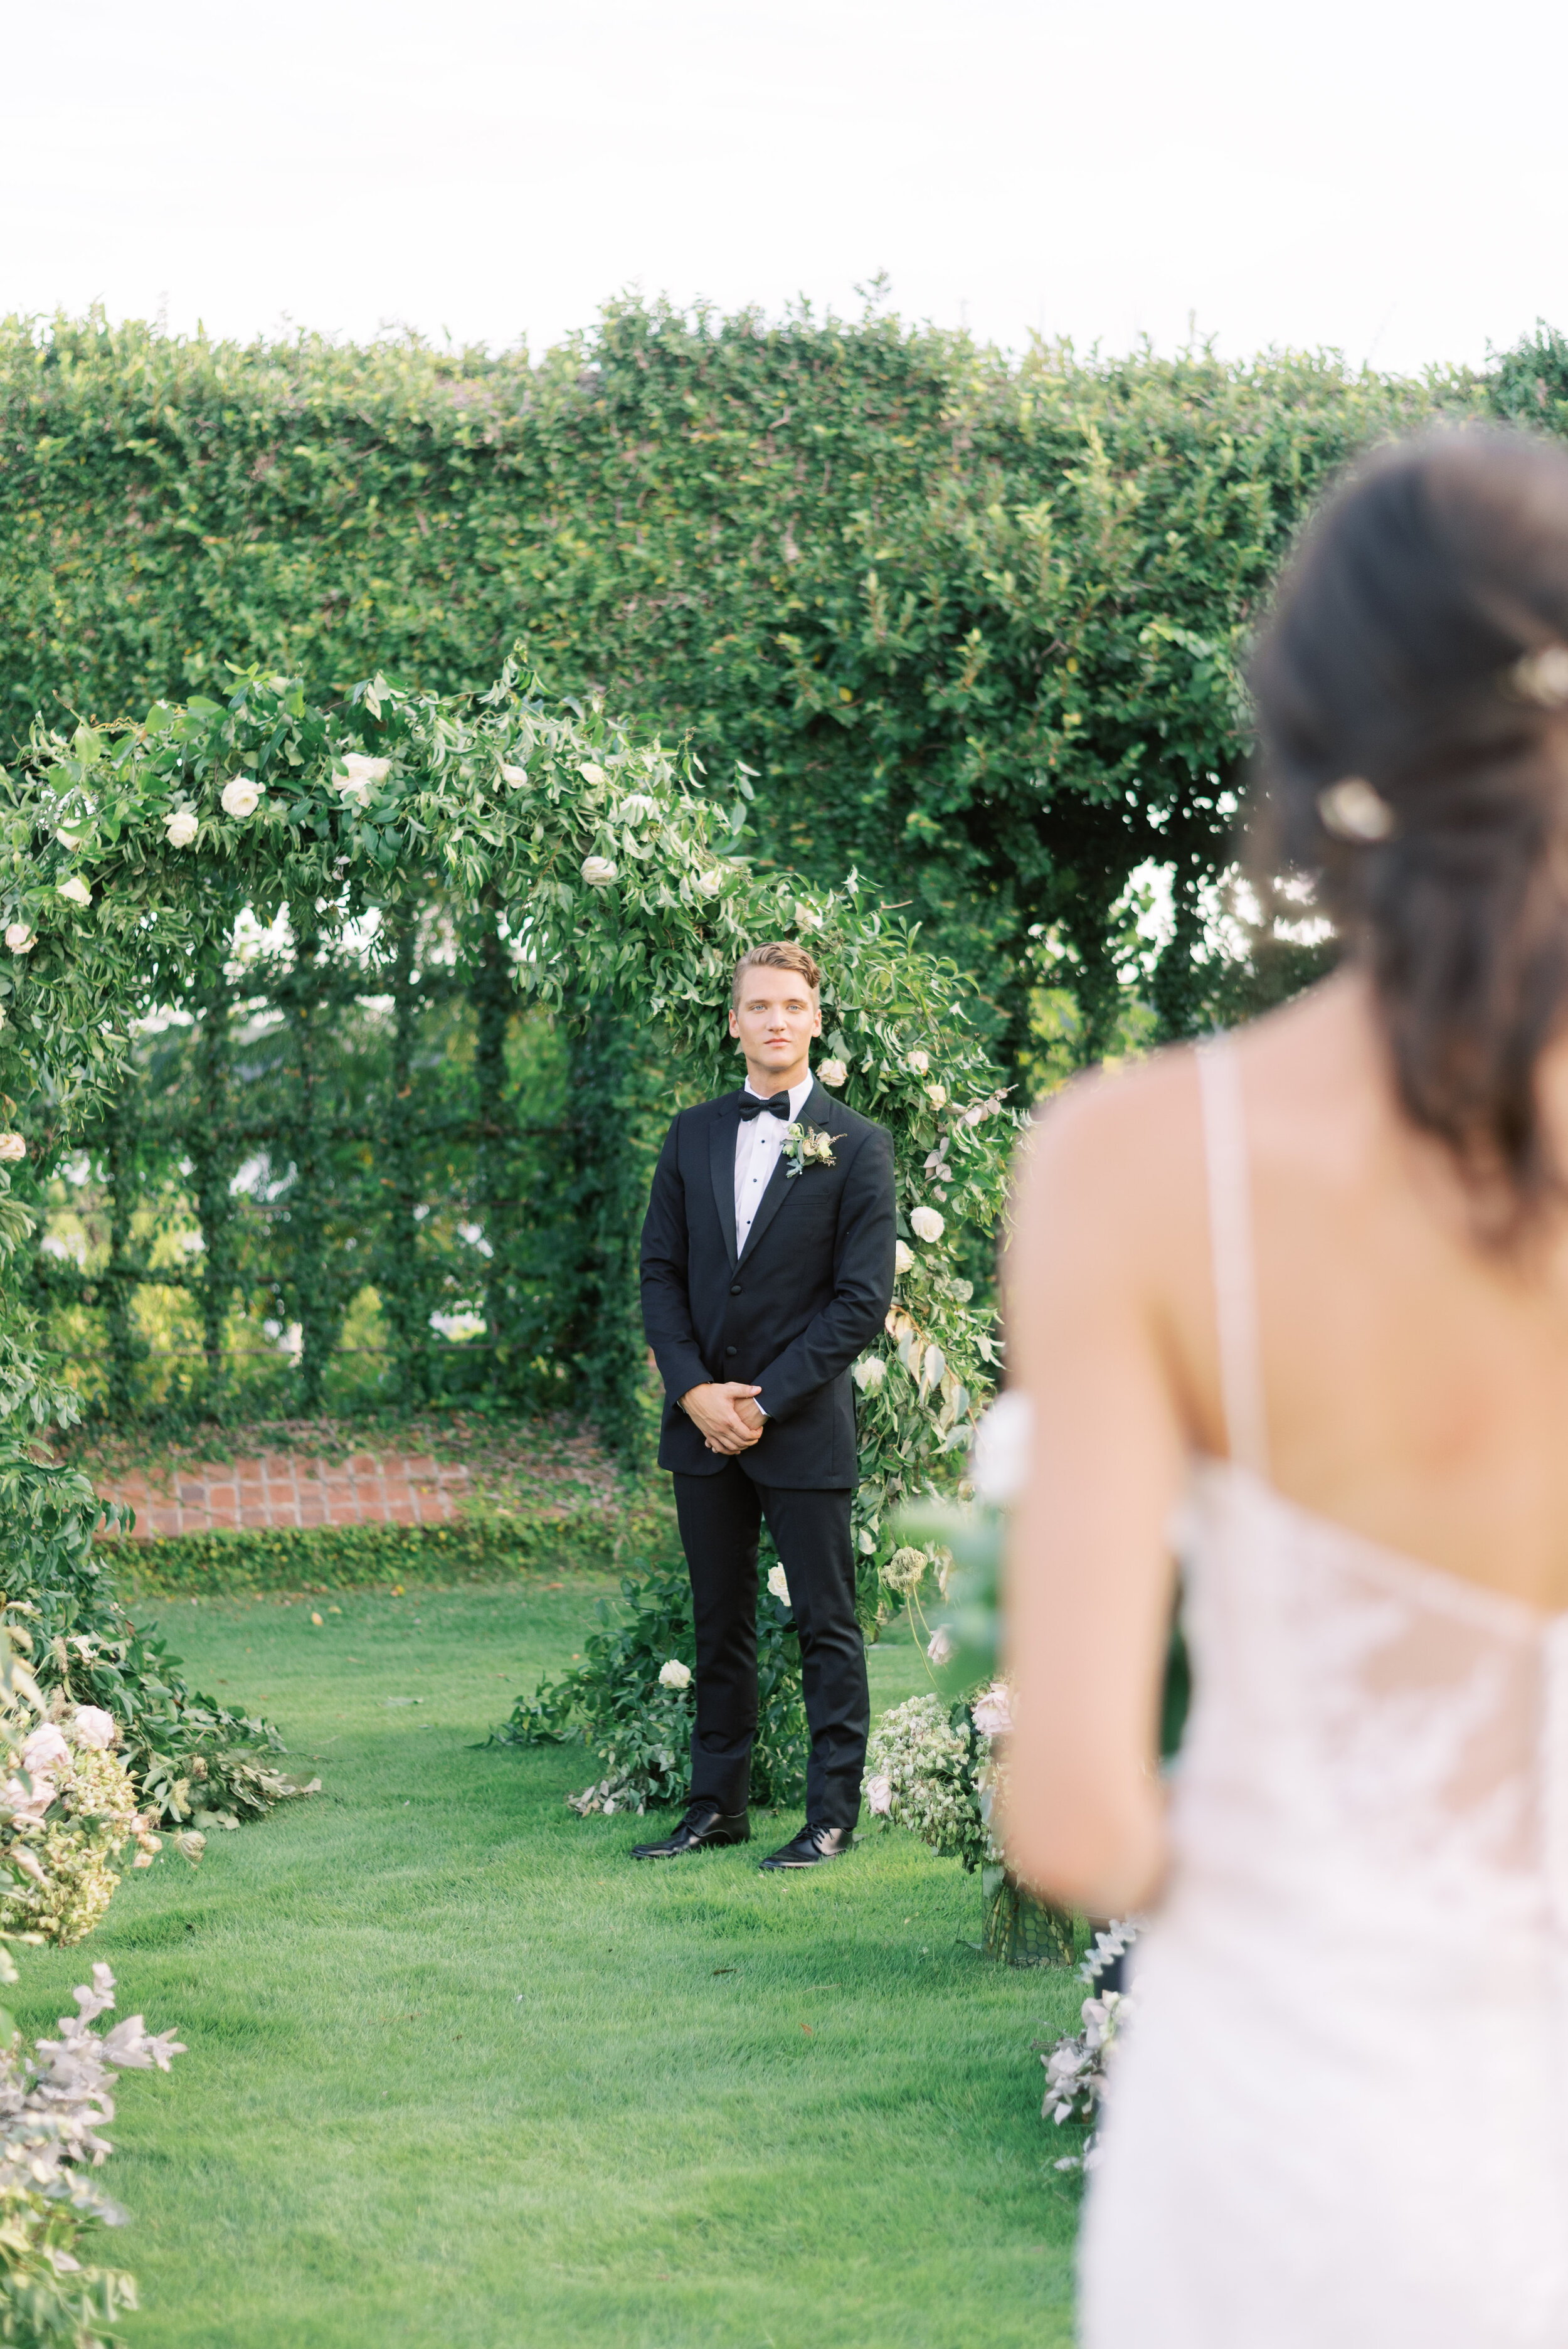 Bibb_Mill_Wedding_Editorial_Columbus_Georgia_Fallen_Photography_6-15.JPG